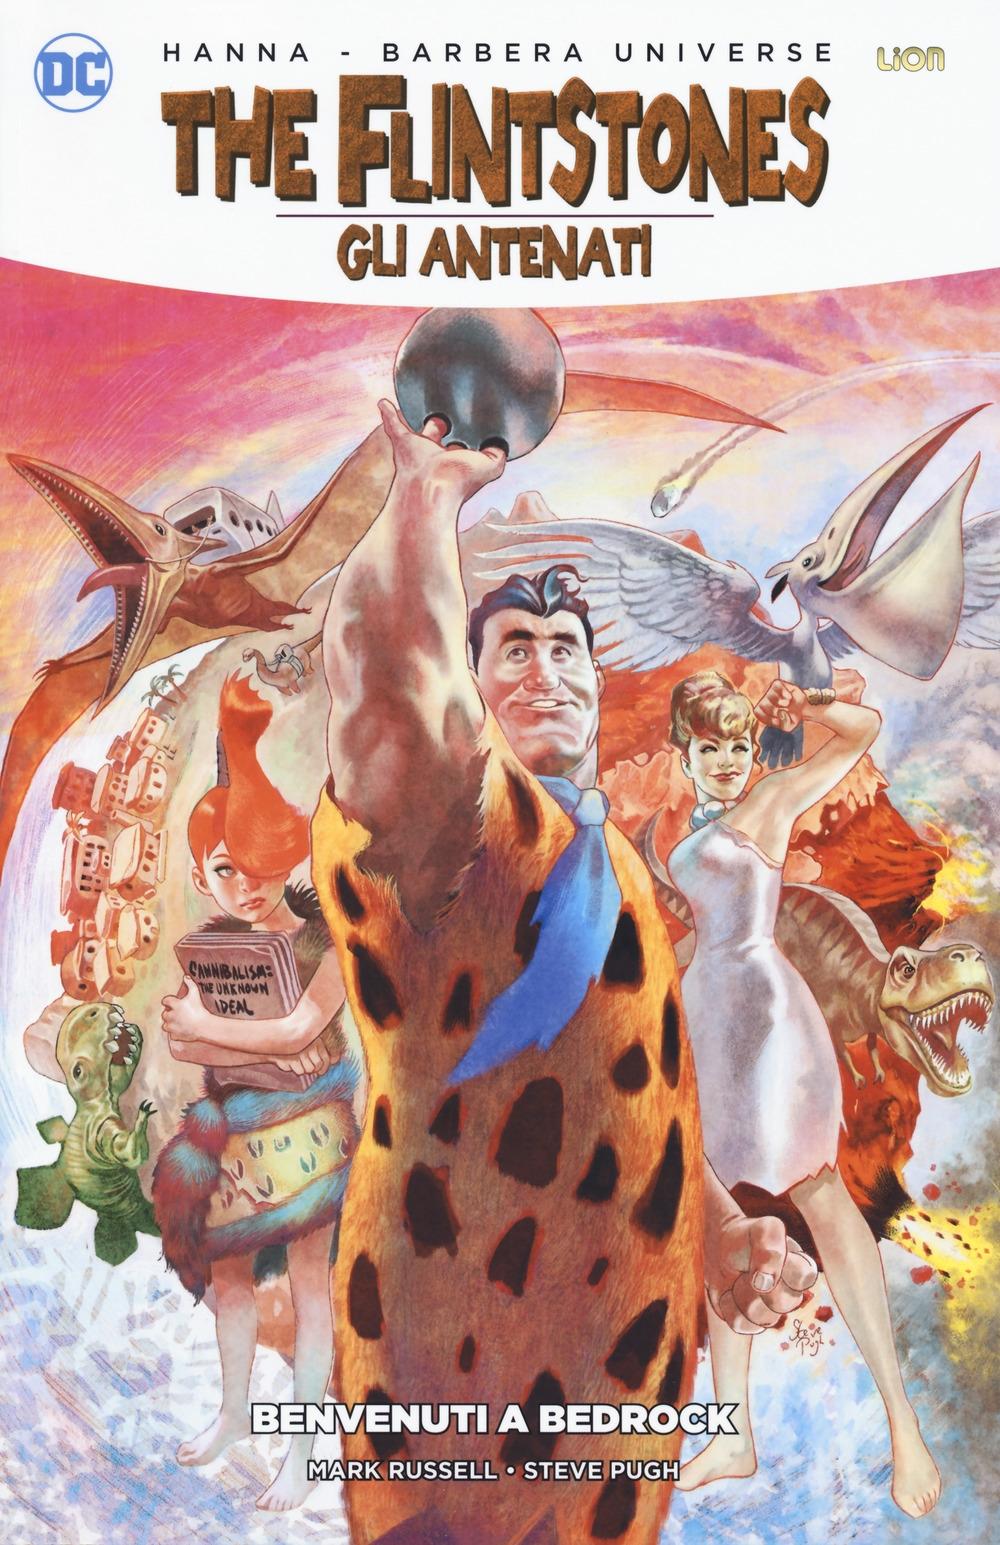 Benvenuti a Bedrock. Gli antenati (The Flintstones)